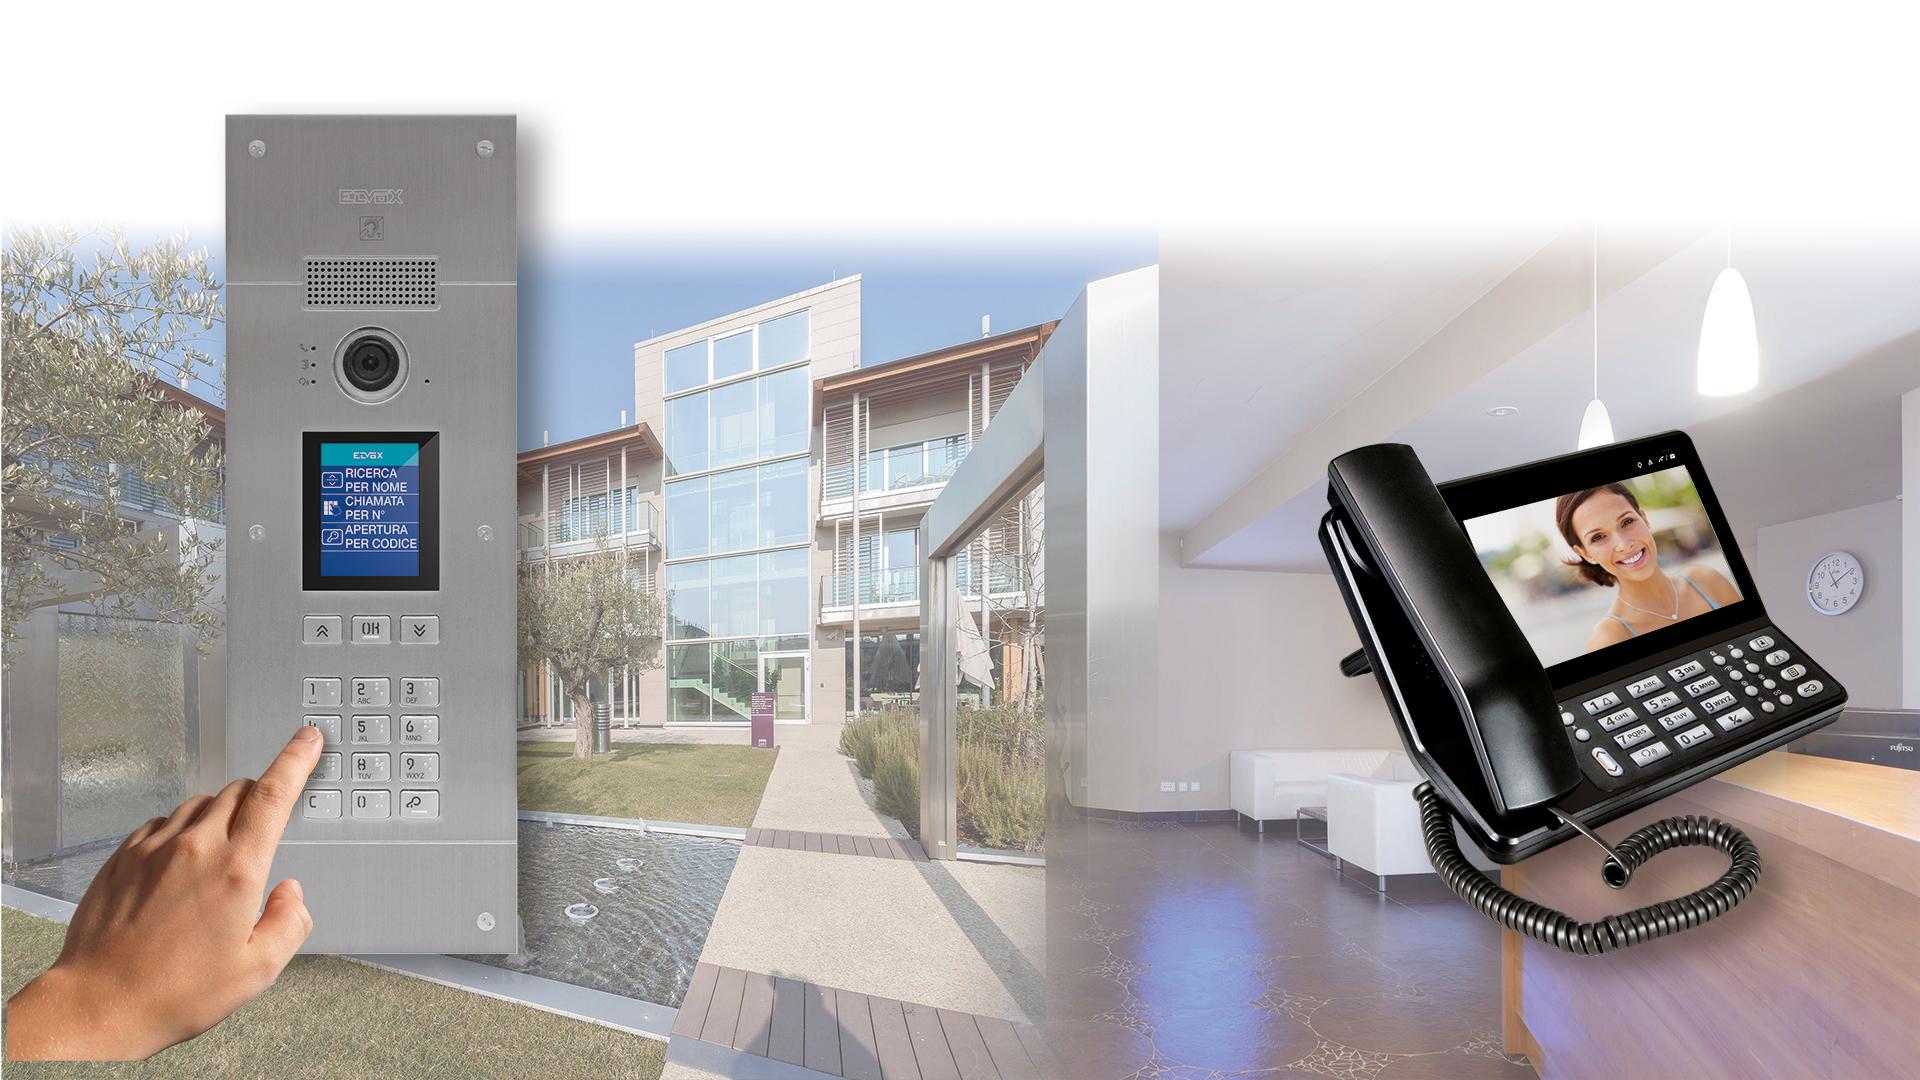 Ricerca Per Immagini Mobile sip video door entry system - vimar energia positiva